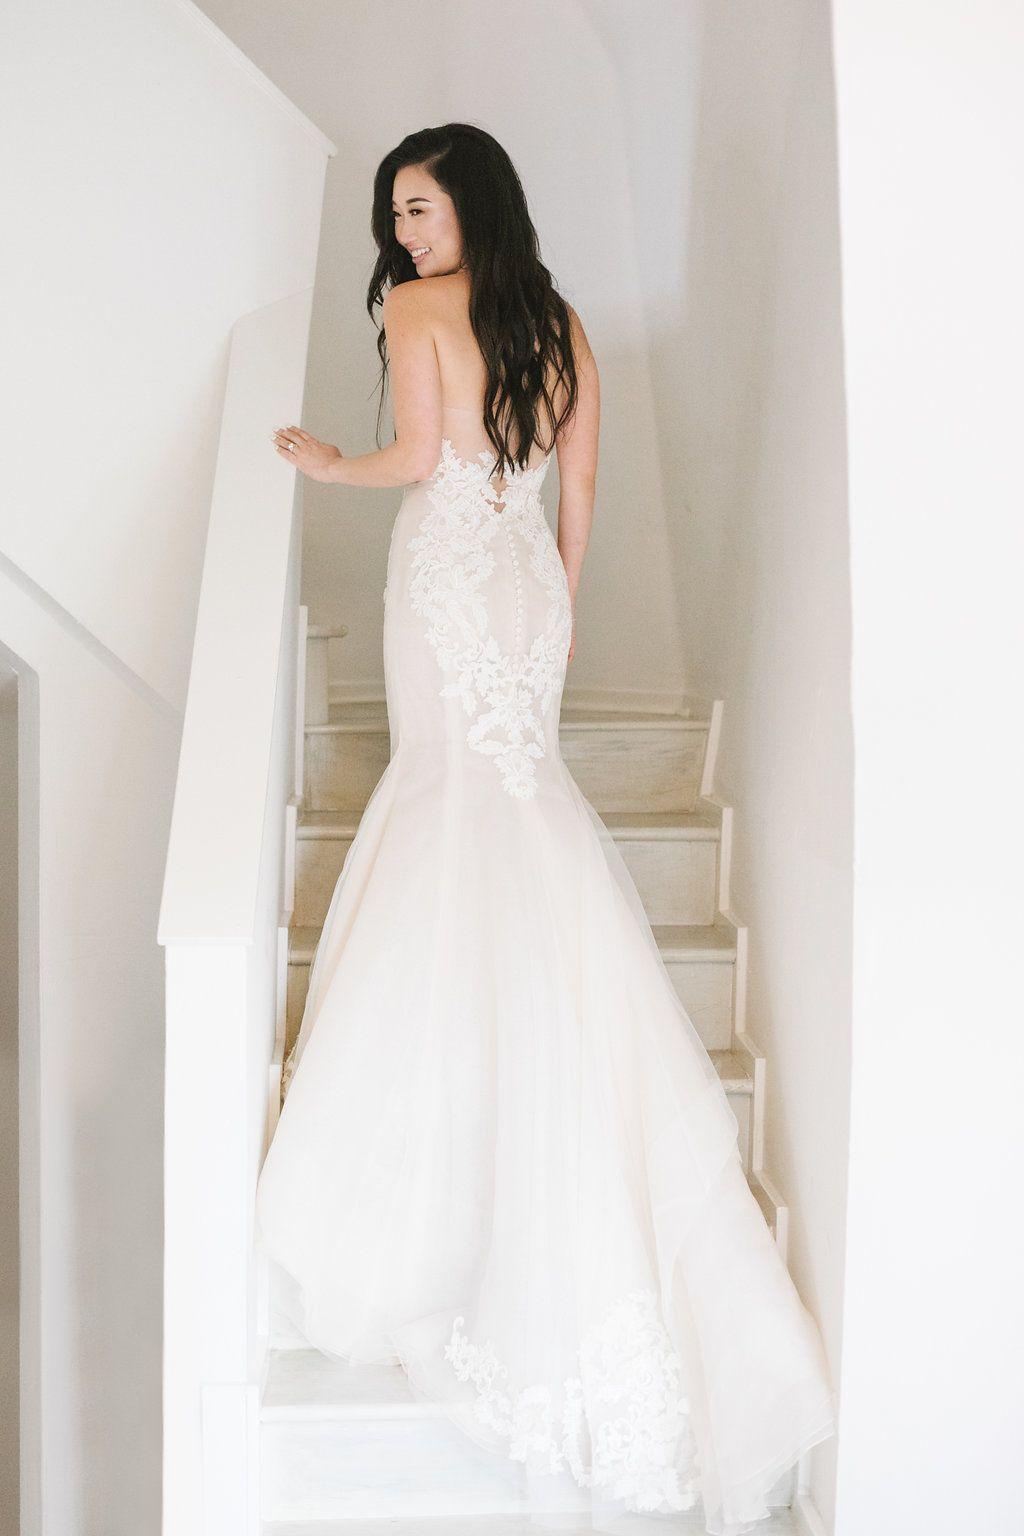 Ethereal wedding dress  Wedding dress of our dreams bride Weddingdress CCLWeddings